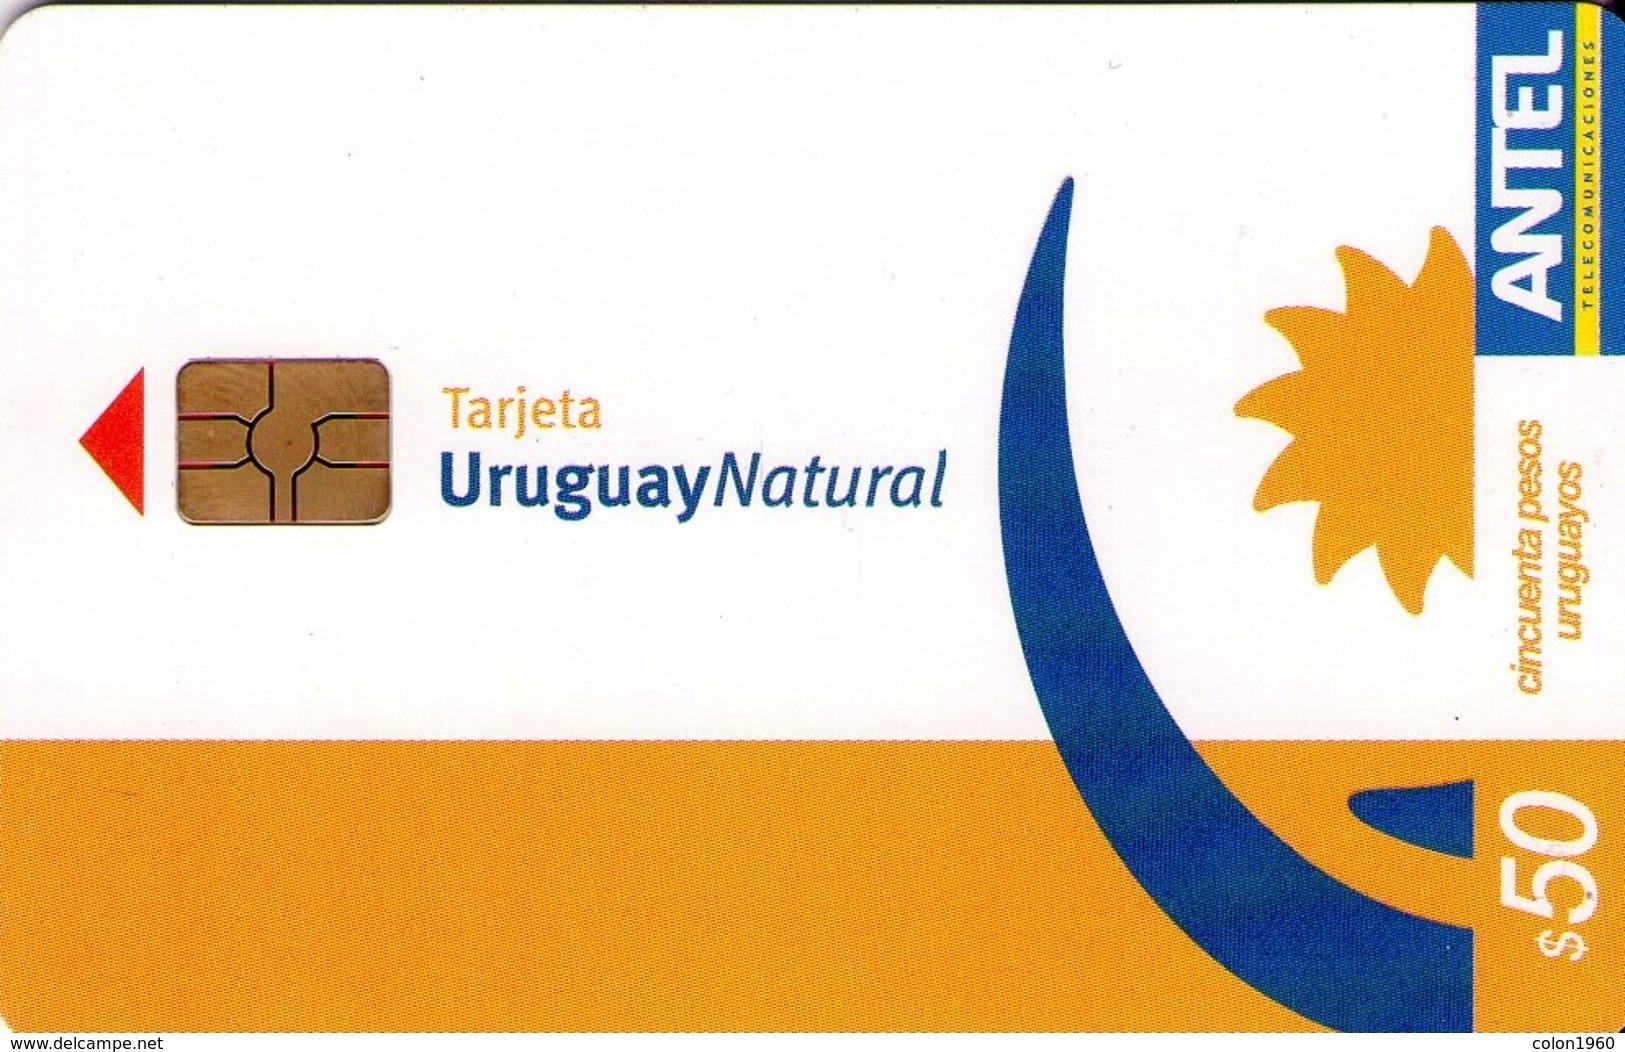 TARJETA TELEFONICA DE URUGUAY, 307a (199) URUGUAY NATURAL - Uruguay